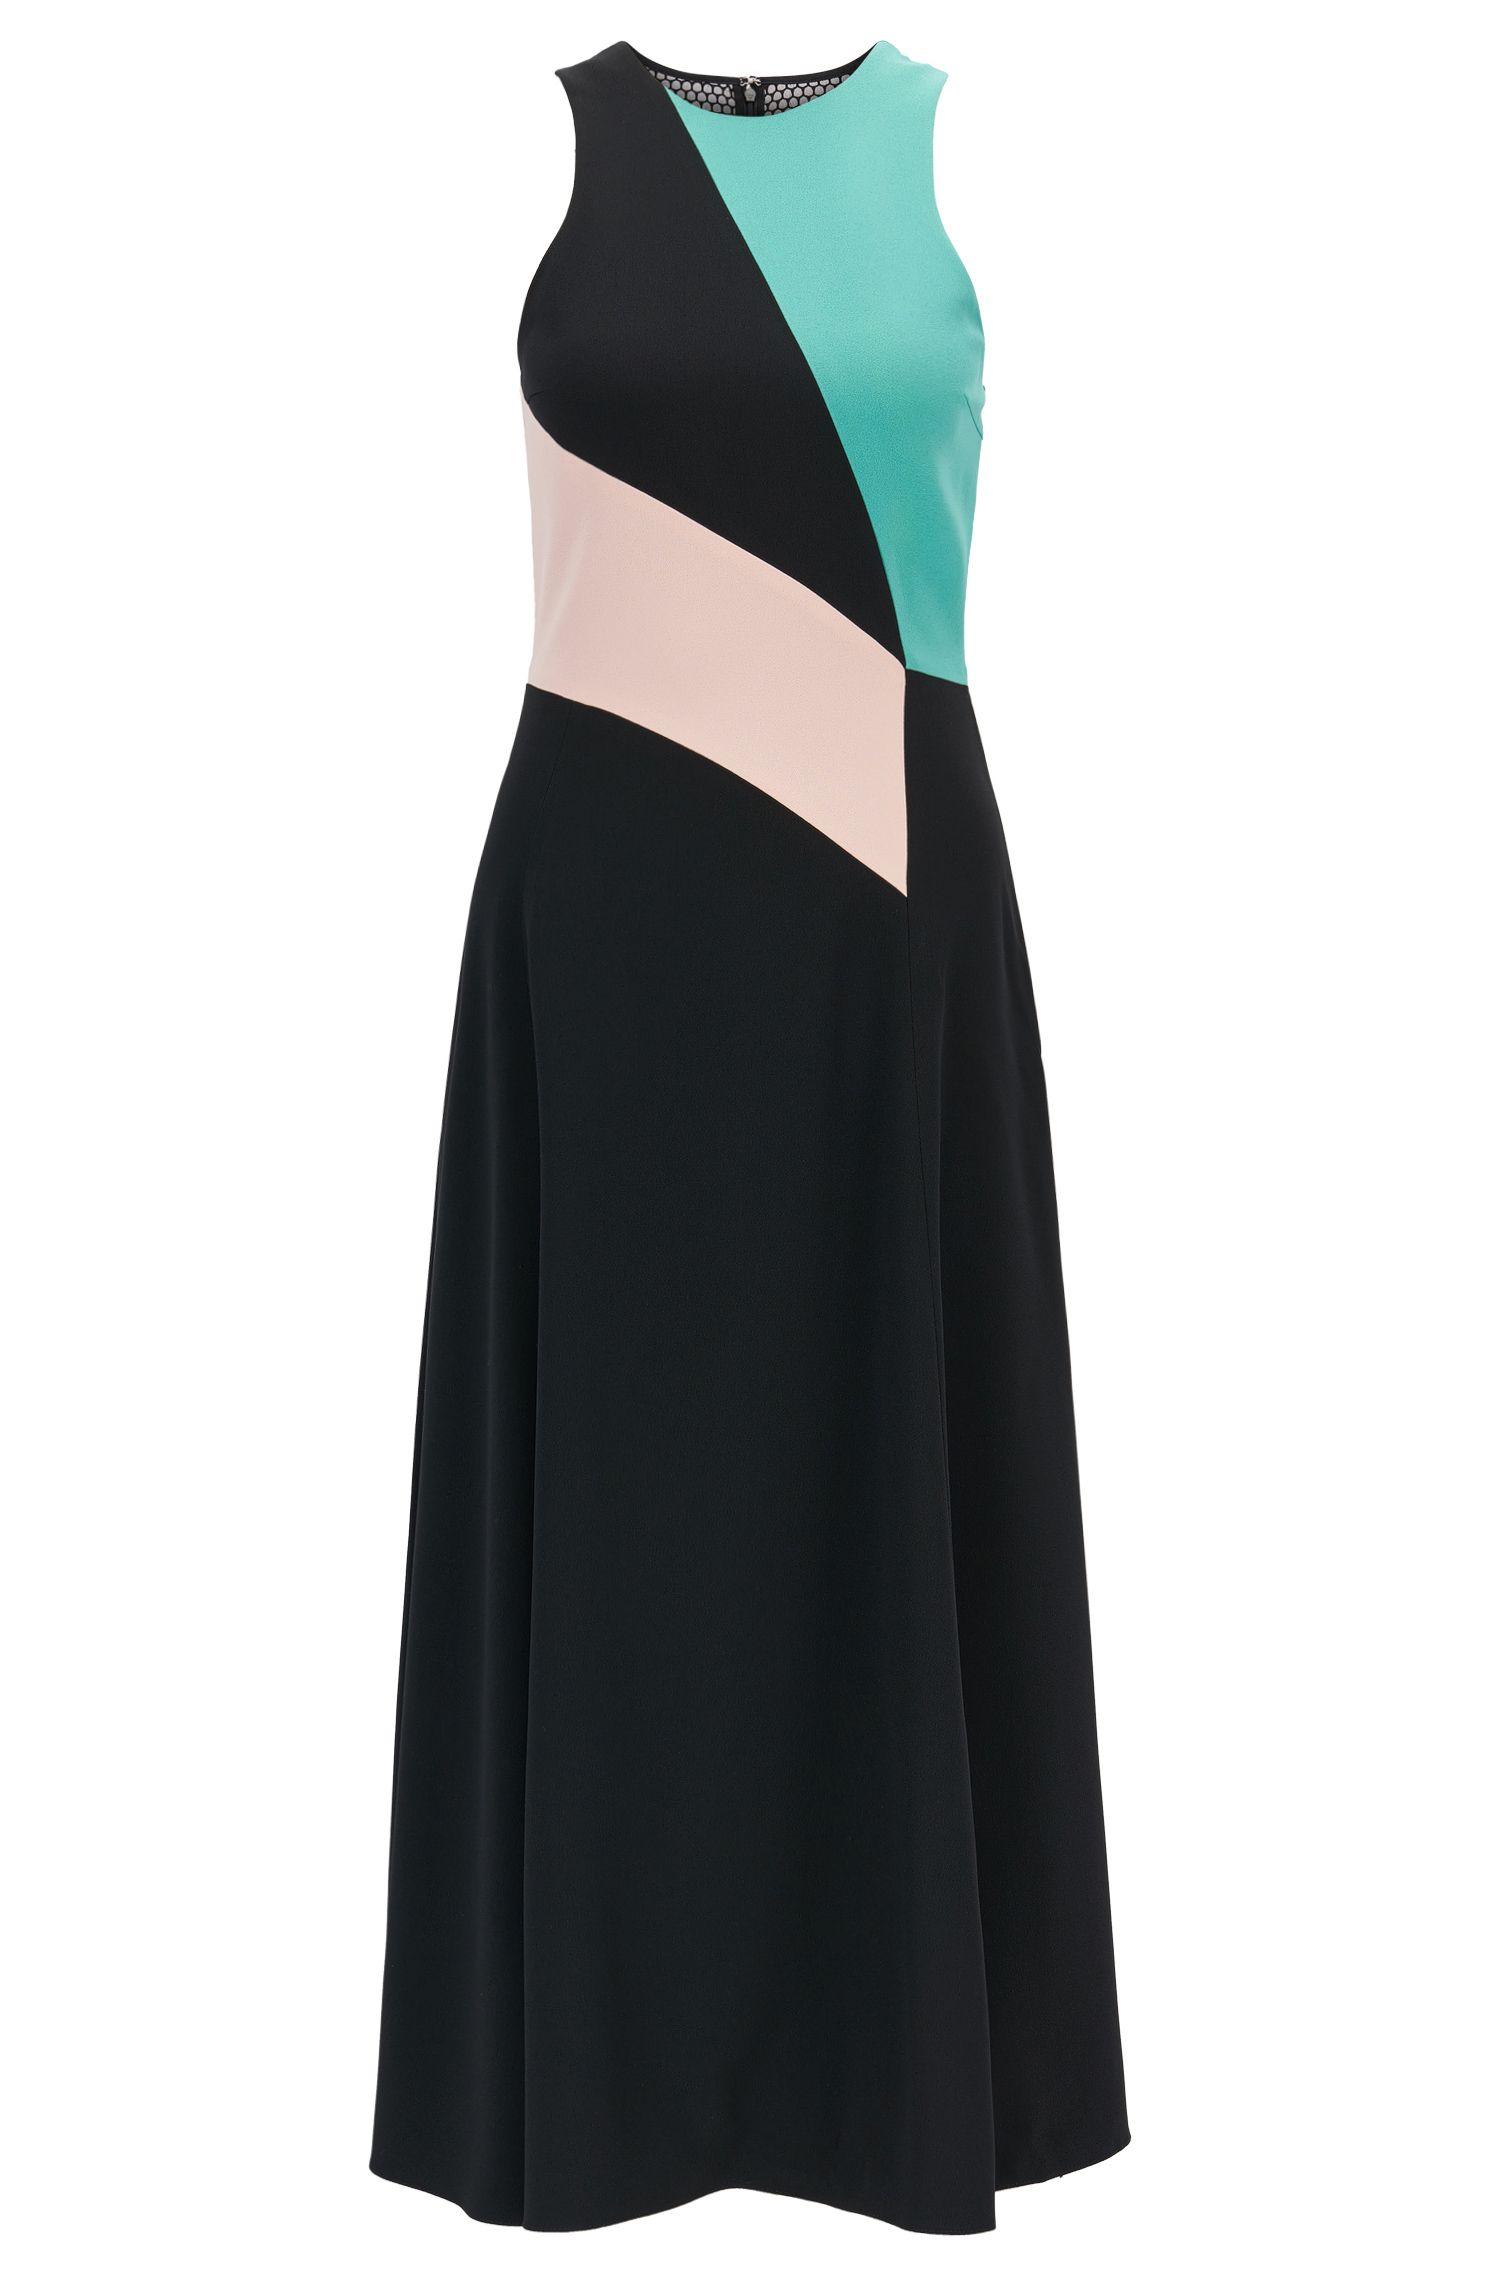 Gallery Collection Crêpe Dress | Dulinera GC, Black